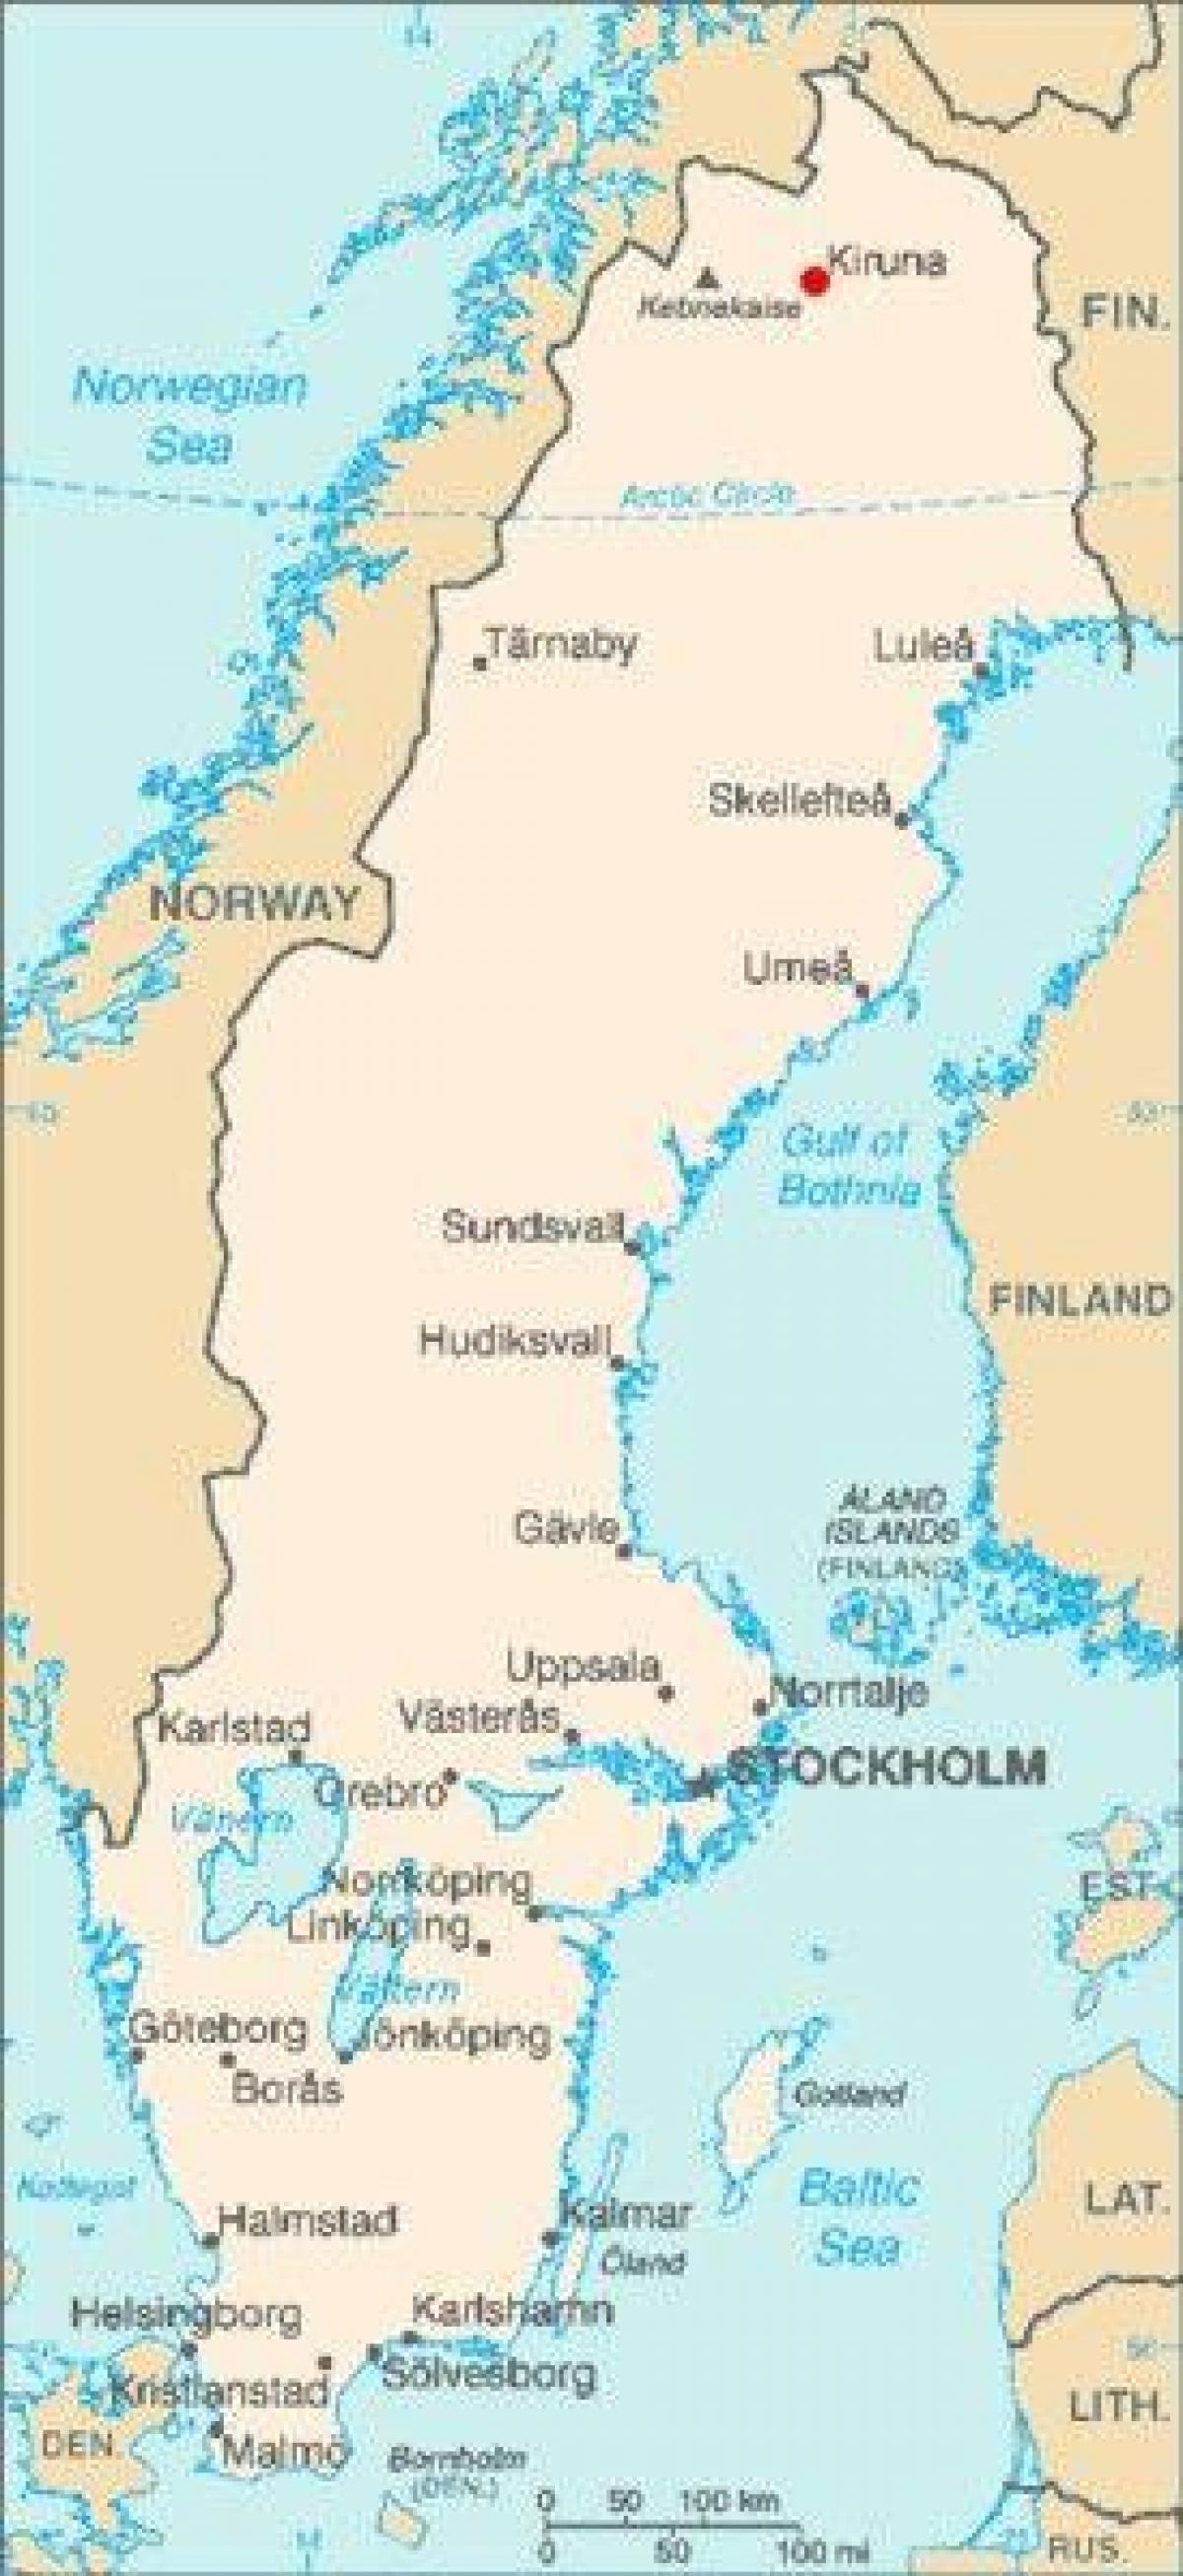 kart over nord europa Kiruna i Sverige kart   Kart over Kiruna i Sverige (Nord Europa  kart over nord europa